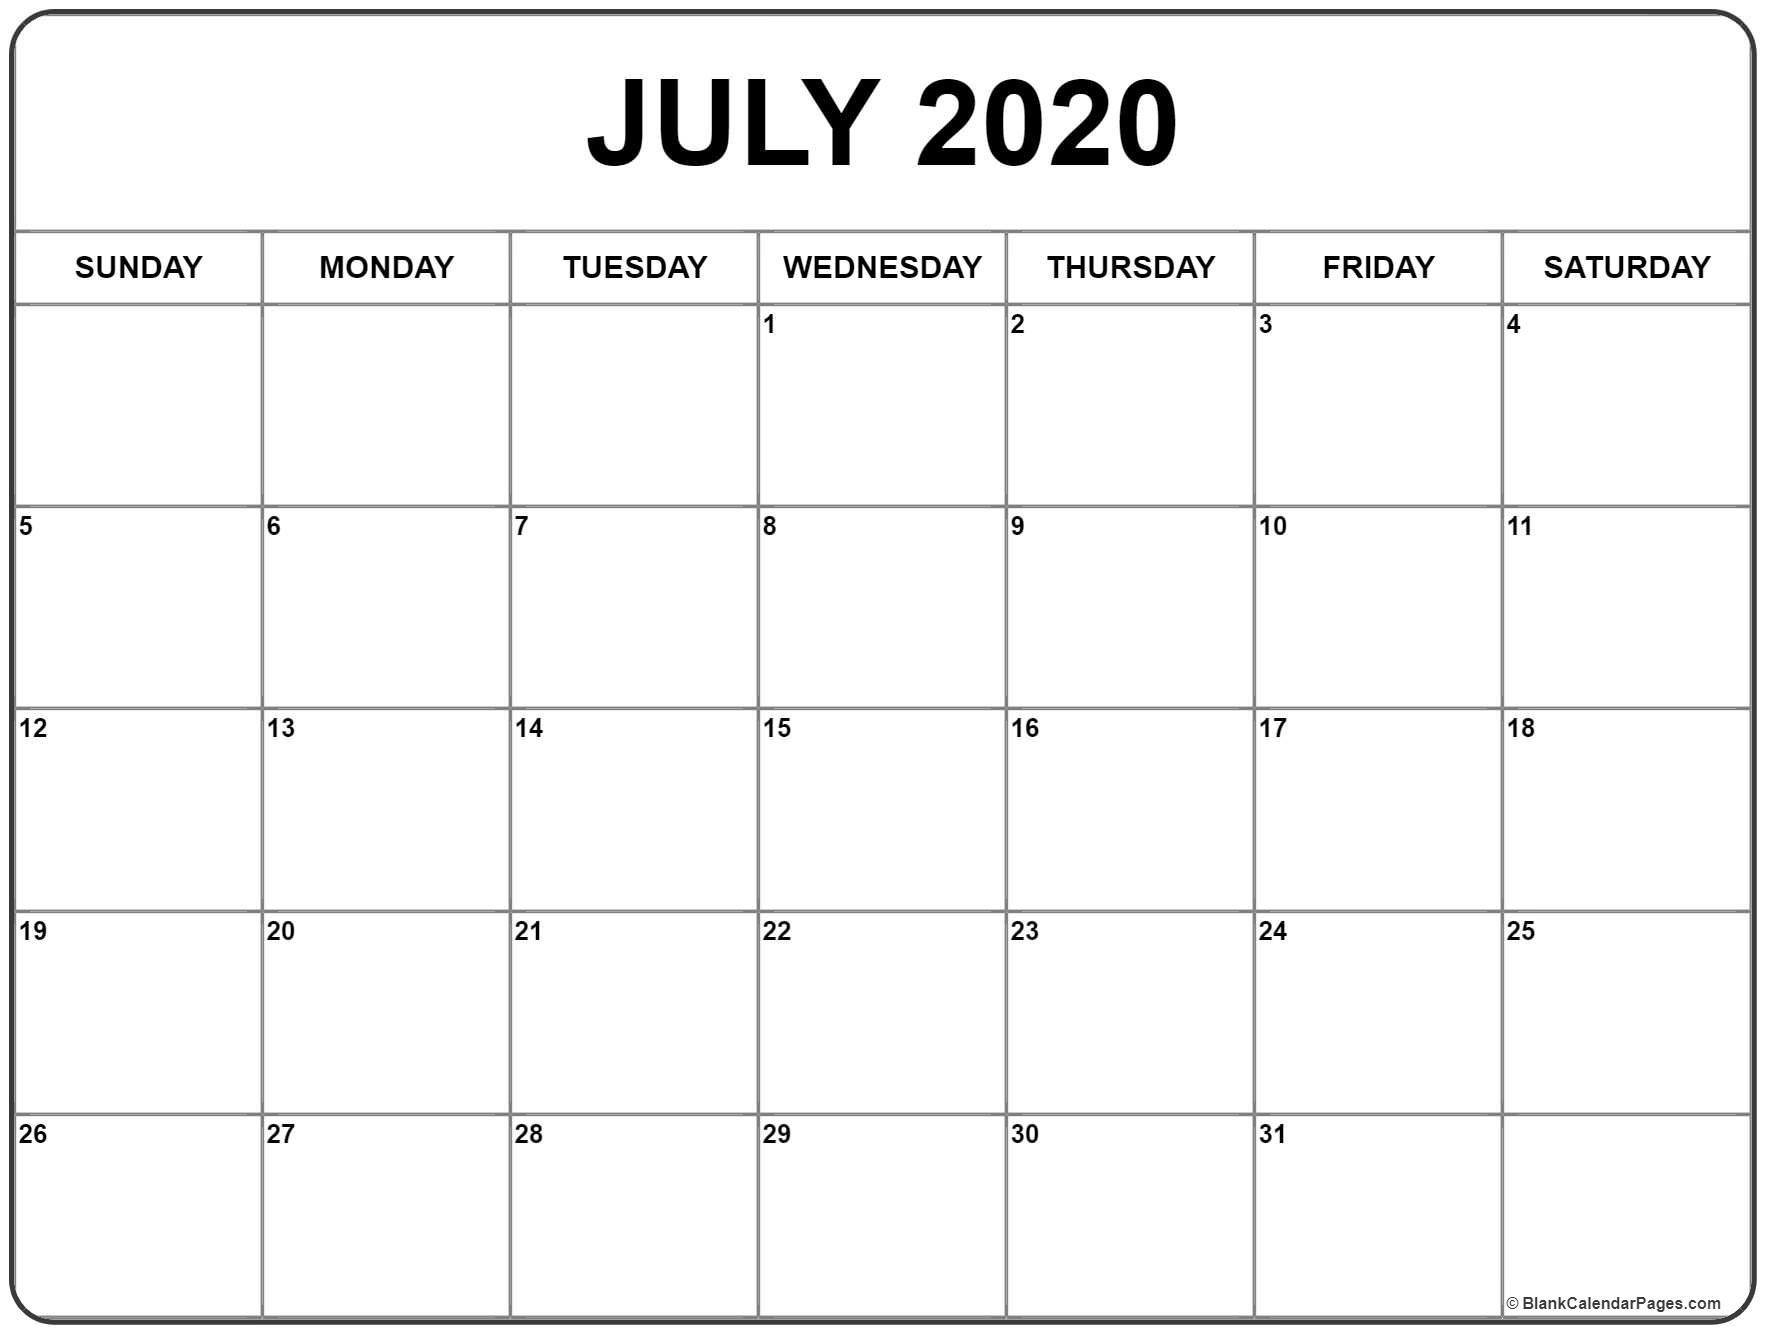 July 2020 Calendar | Printable Calendars | Printable Blank-Printable Monthly Template July 2020